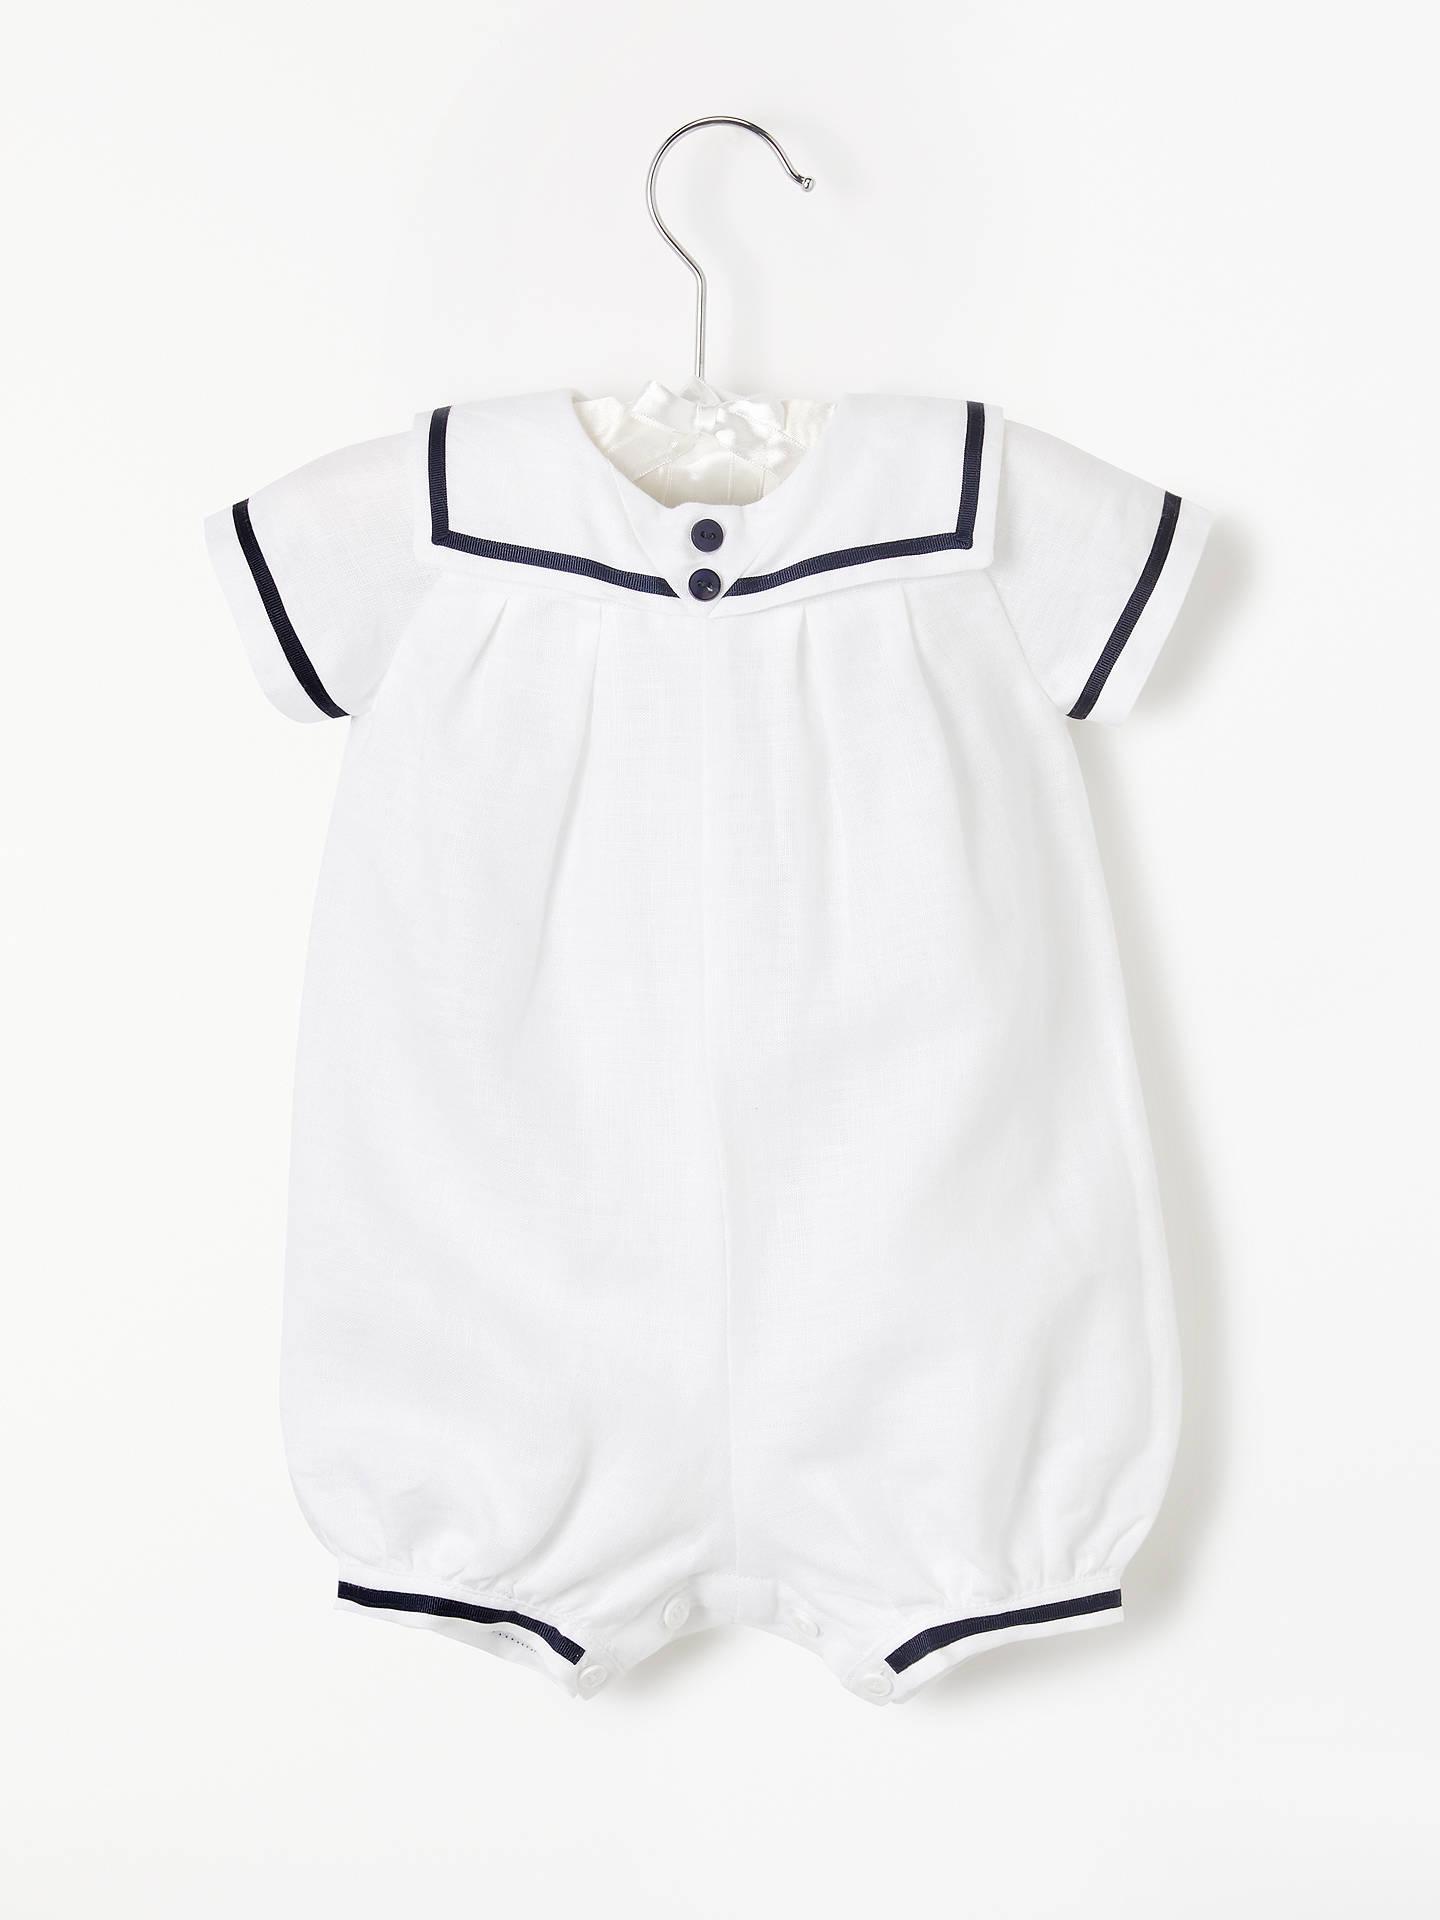 63a005463e1 Buy John Lewis   Partners Baby Linen Sailor Romper